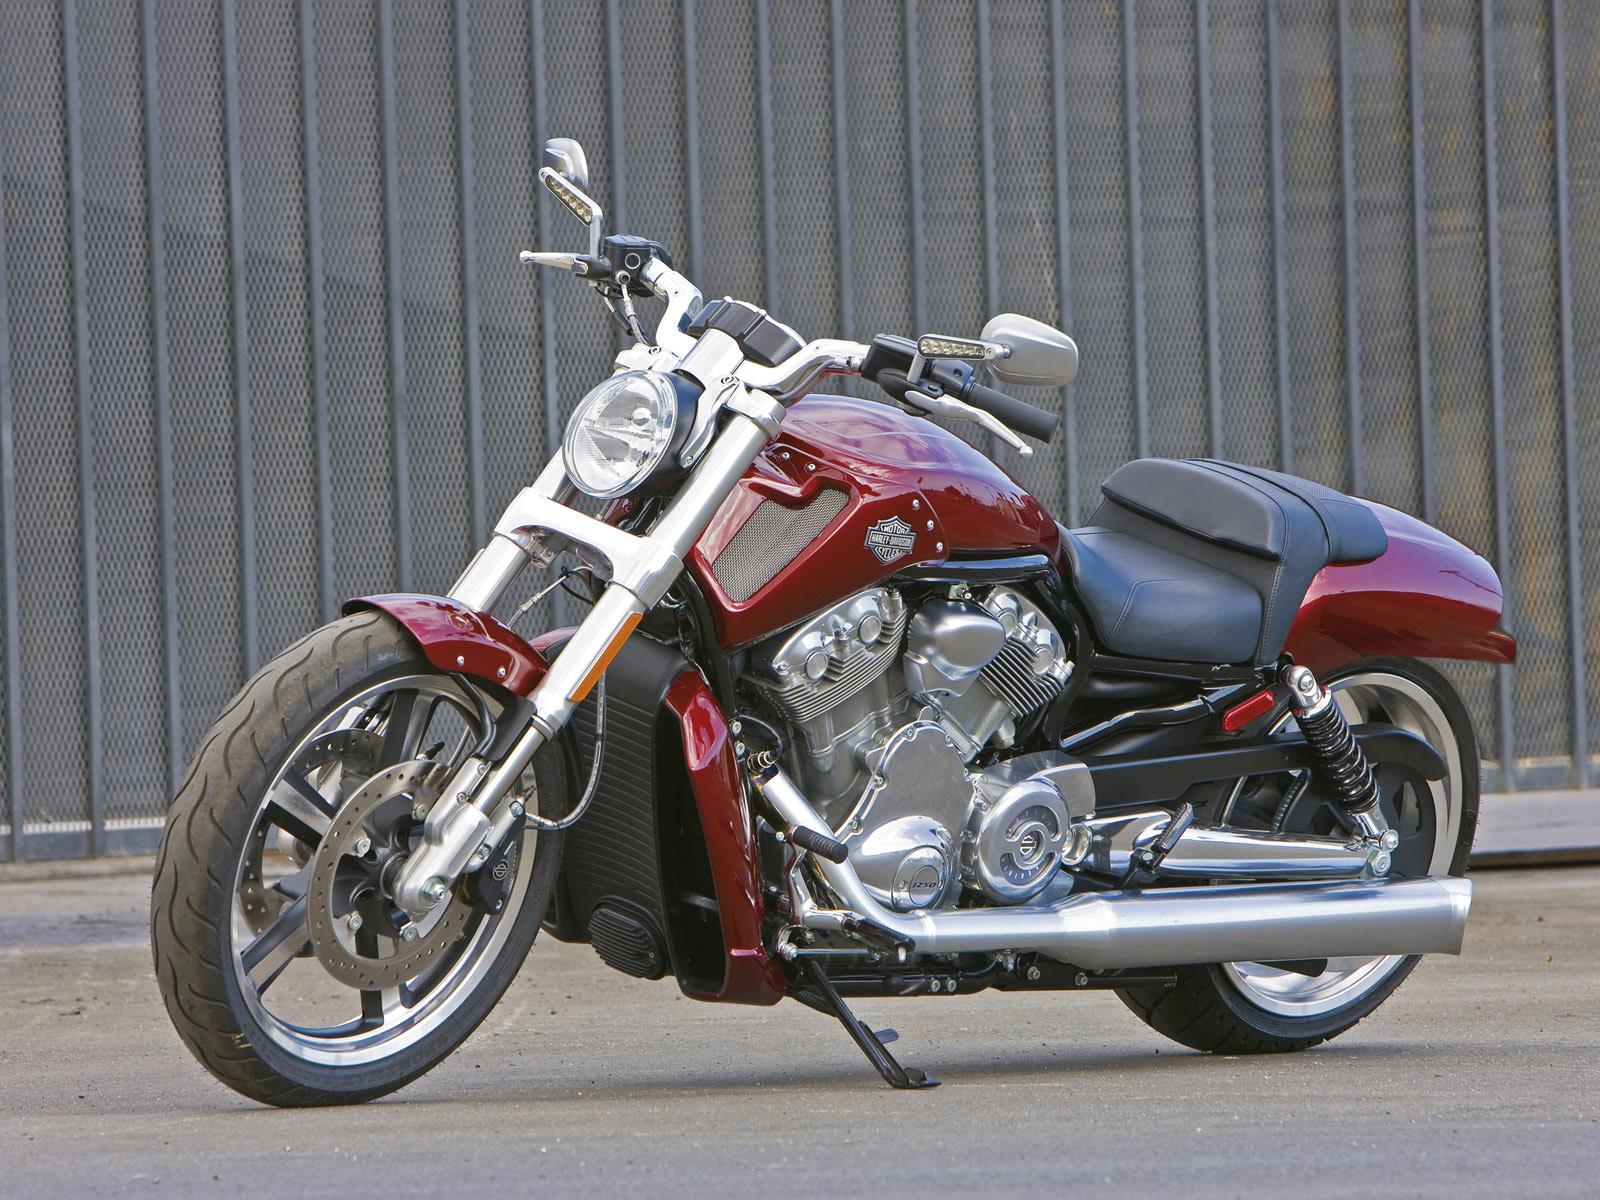 Harley Davidson V Rod Muscle Wallpapers 1600x1200